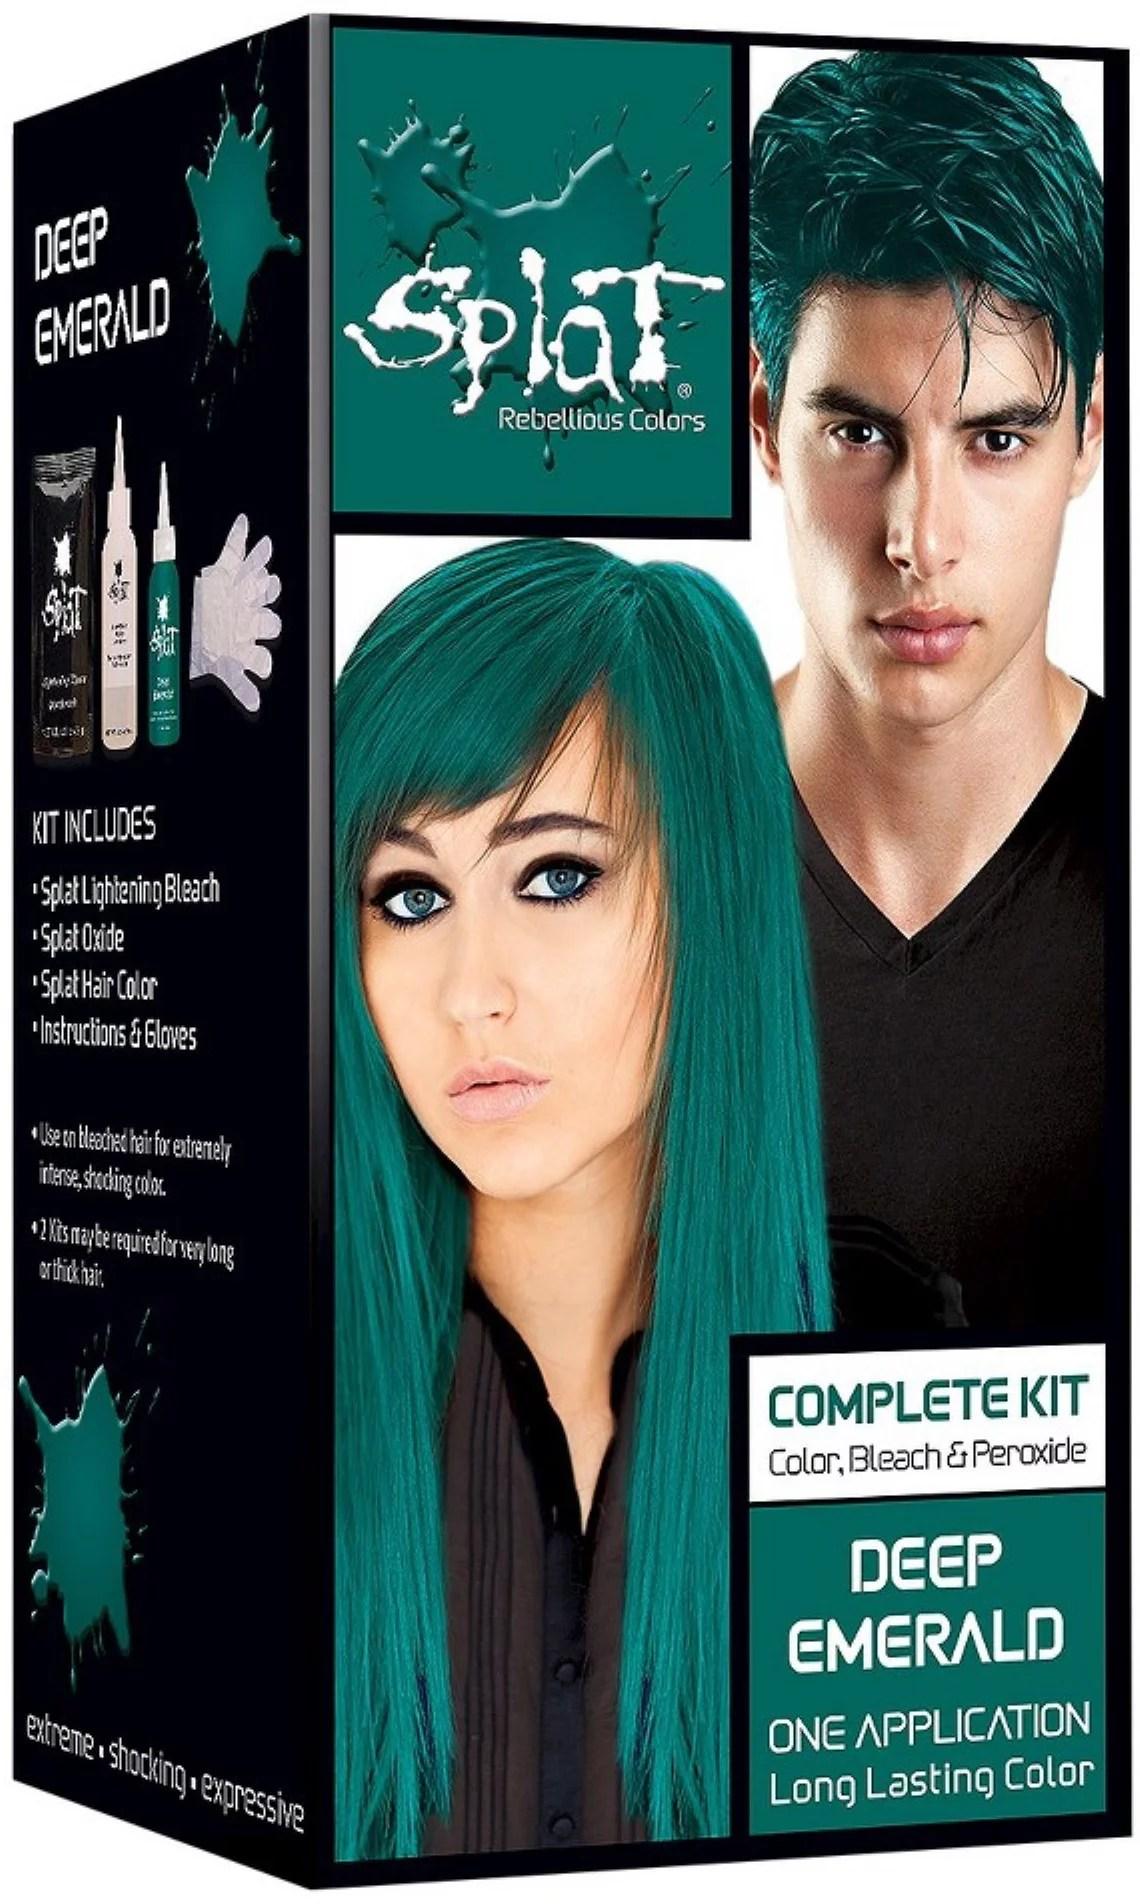 Splat Rebellious Colors Hair Coloring Complete Kit Deep Emerald 1 Ea Pack Of 2